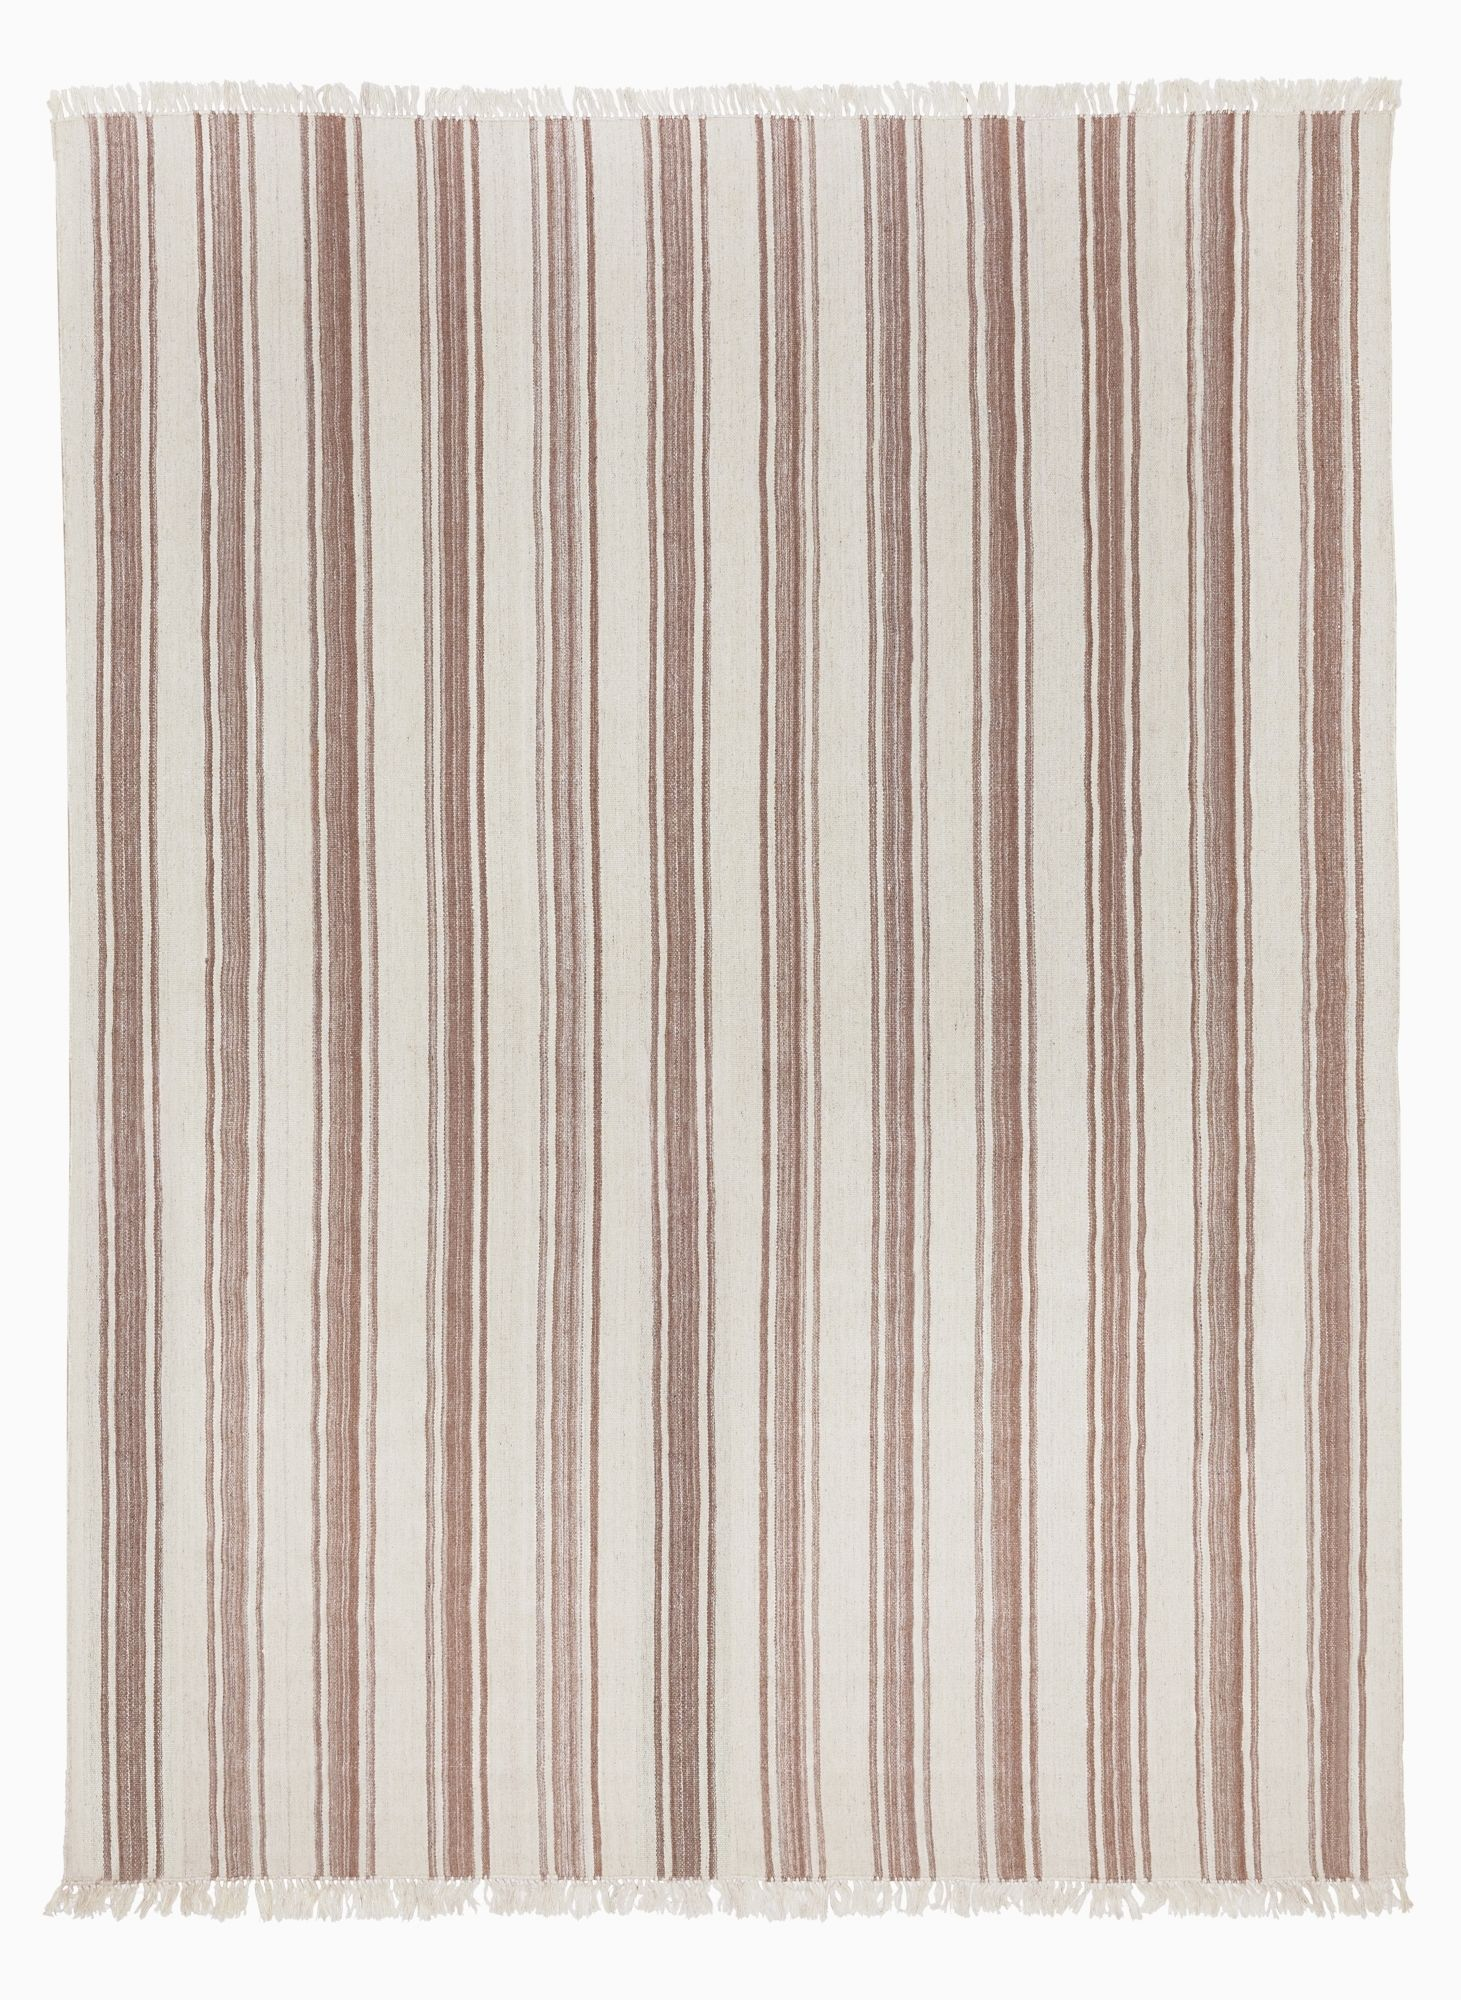 Rana Rug Tan Rug Rugs On Carpet Earthy Home Decor #tan #rugs #for #living #room